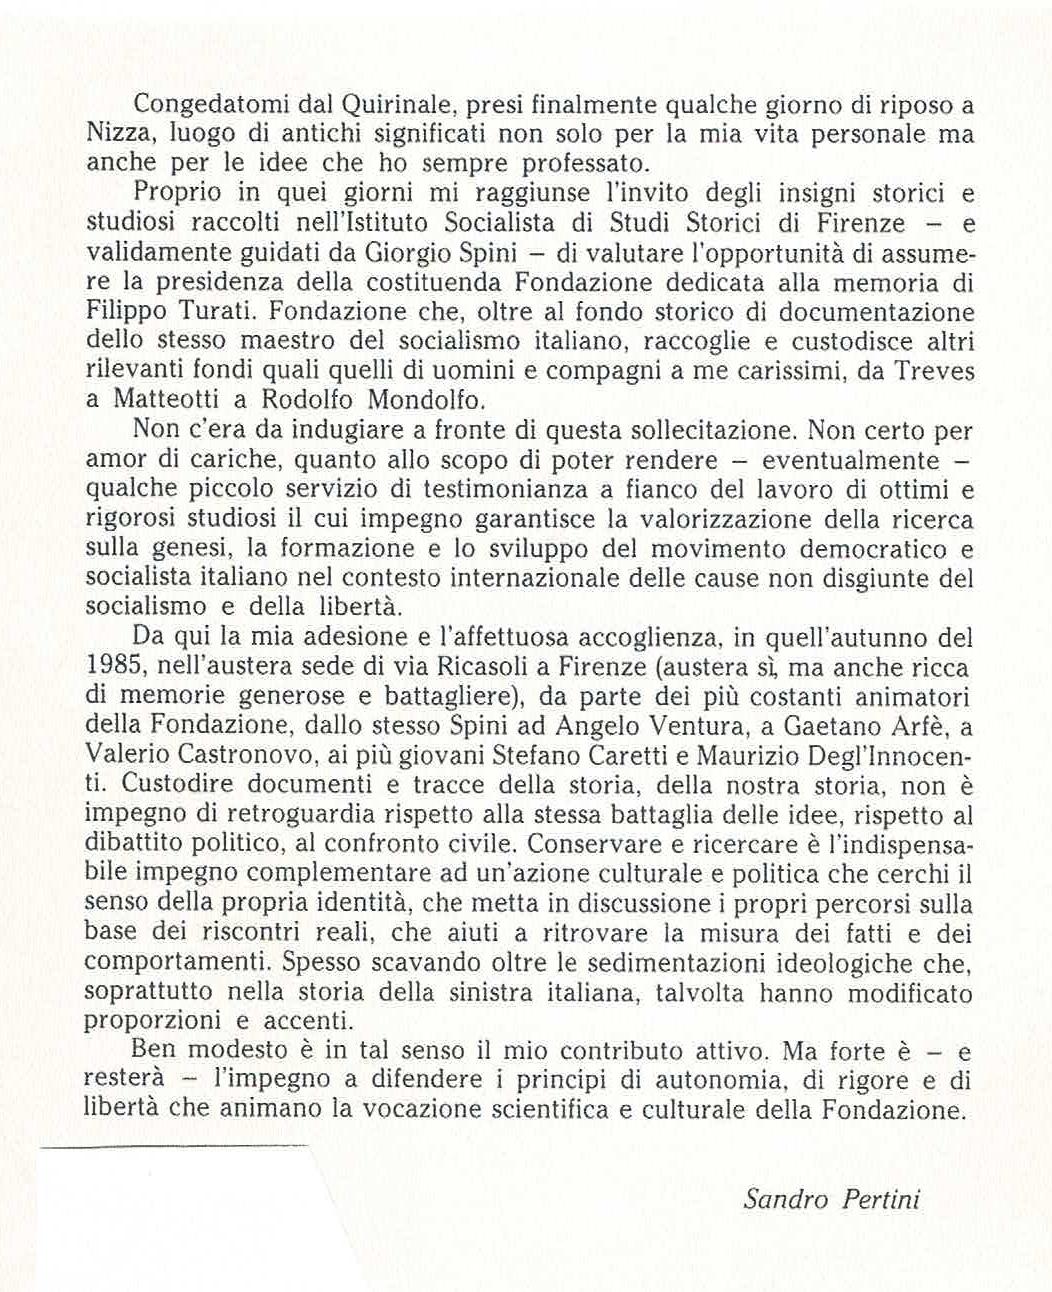 Testimonianza_Sandro_Pertini